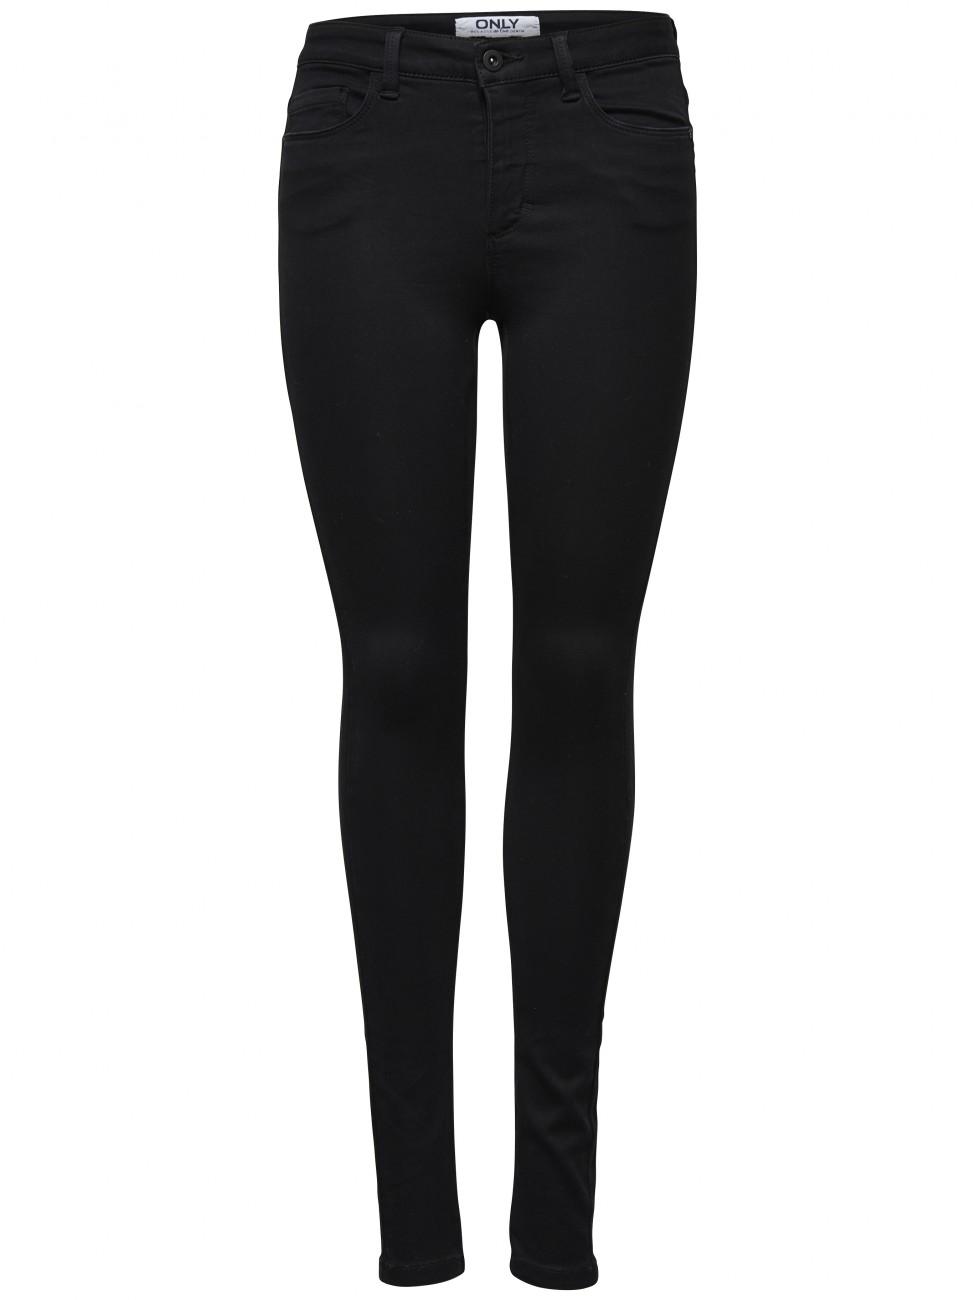 Only Damen Jeans Royal - Skinny Fit - Black